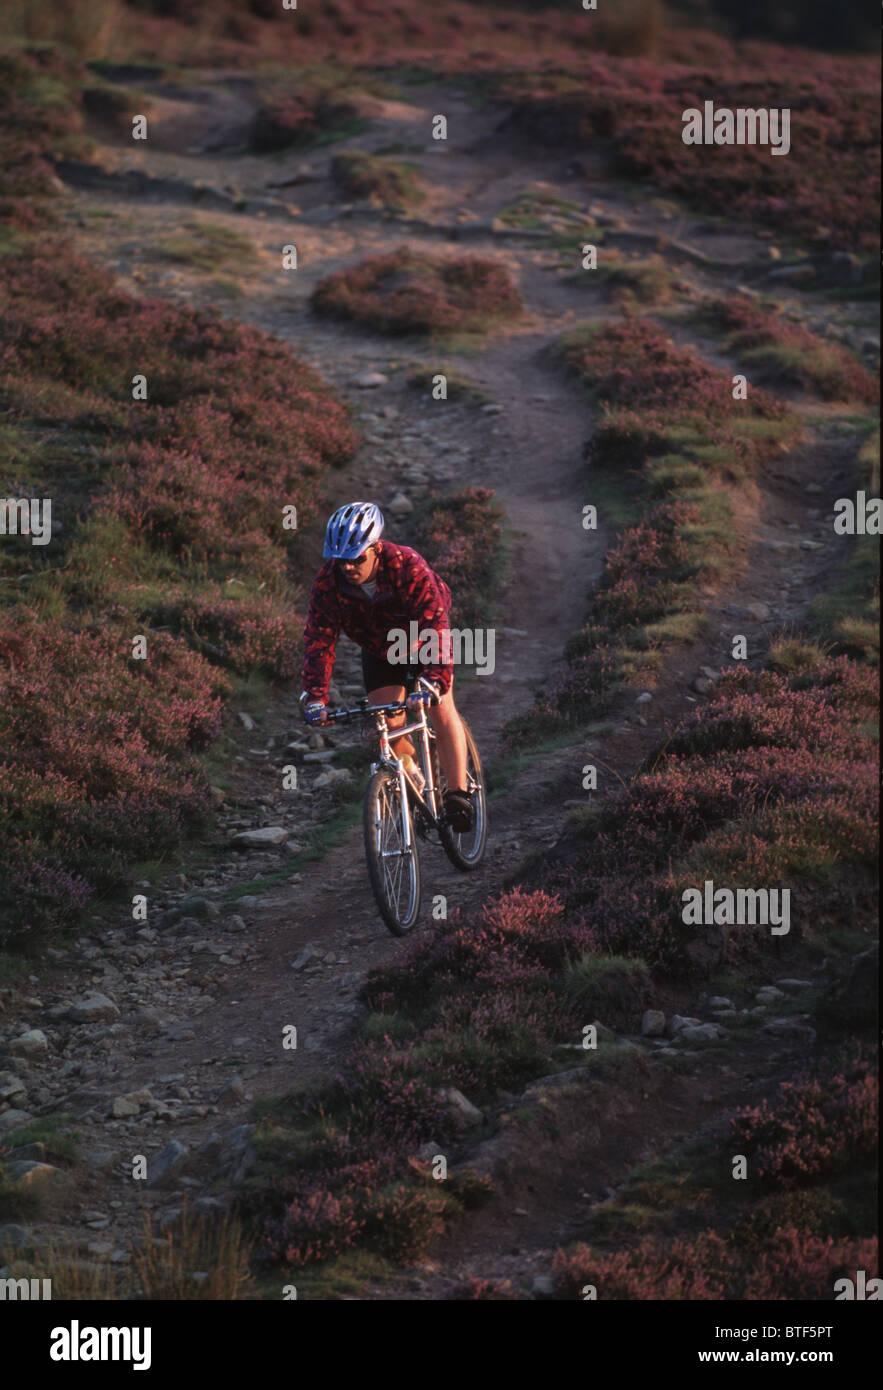 Mountain biking in the Peak District Stock Photo